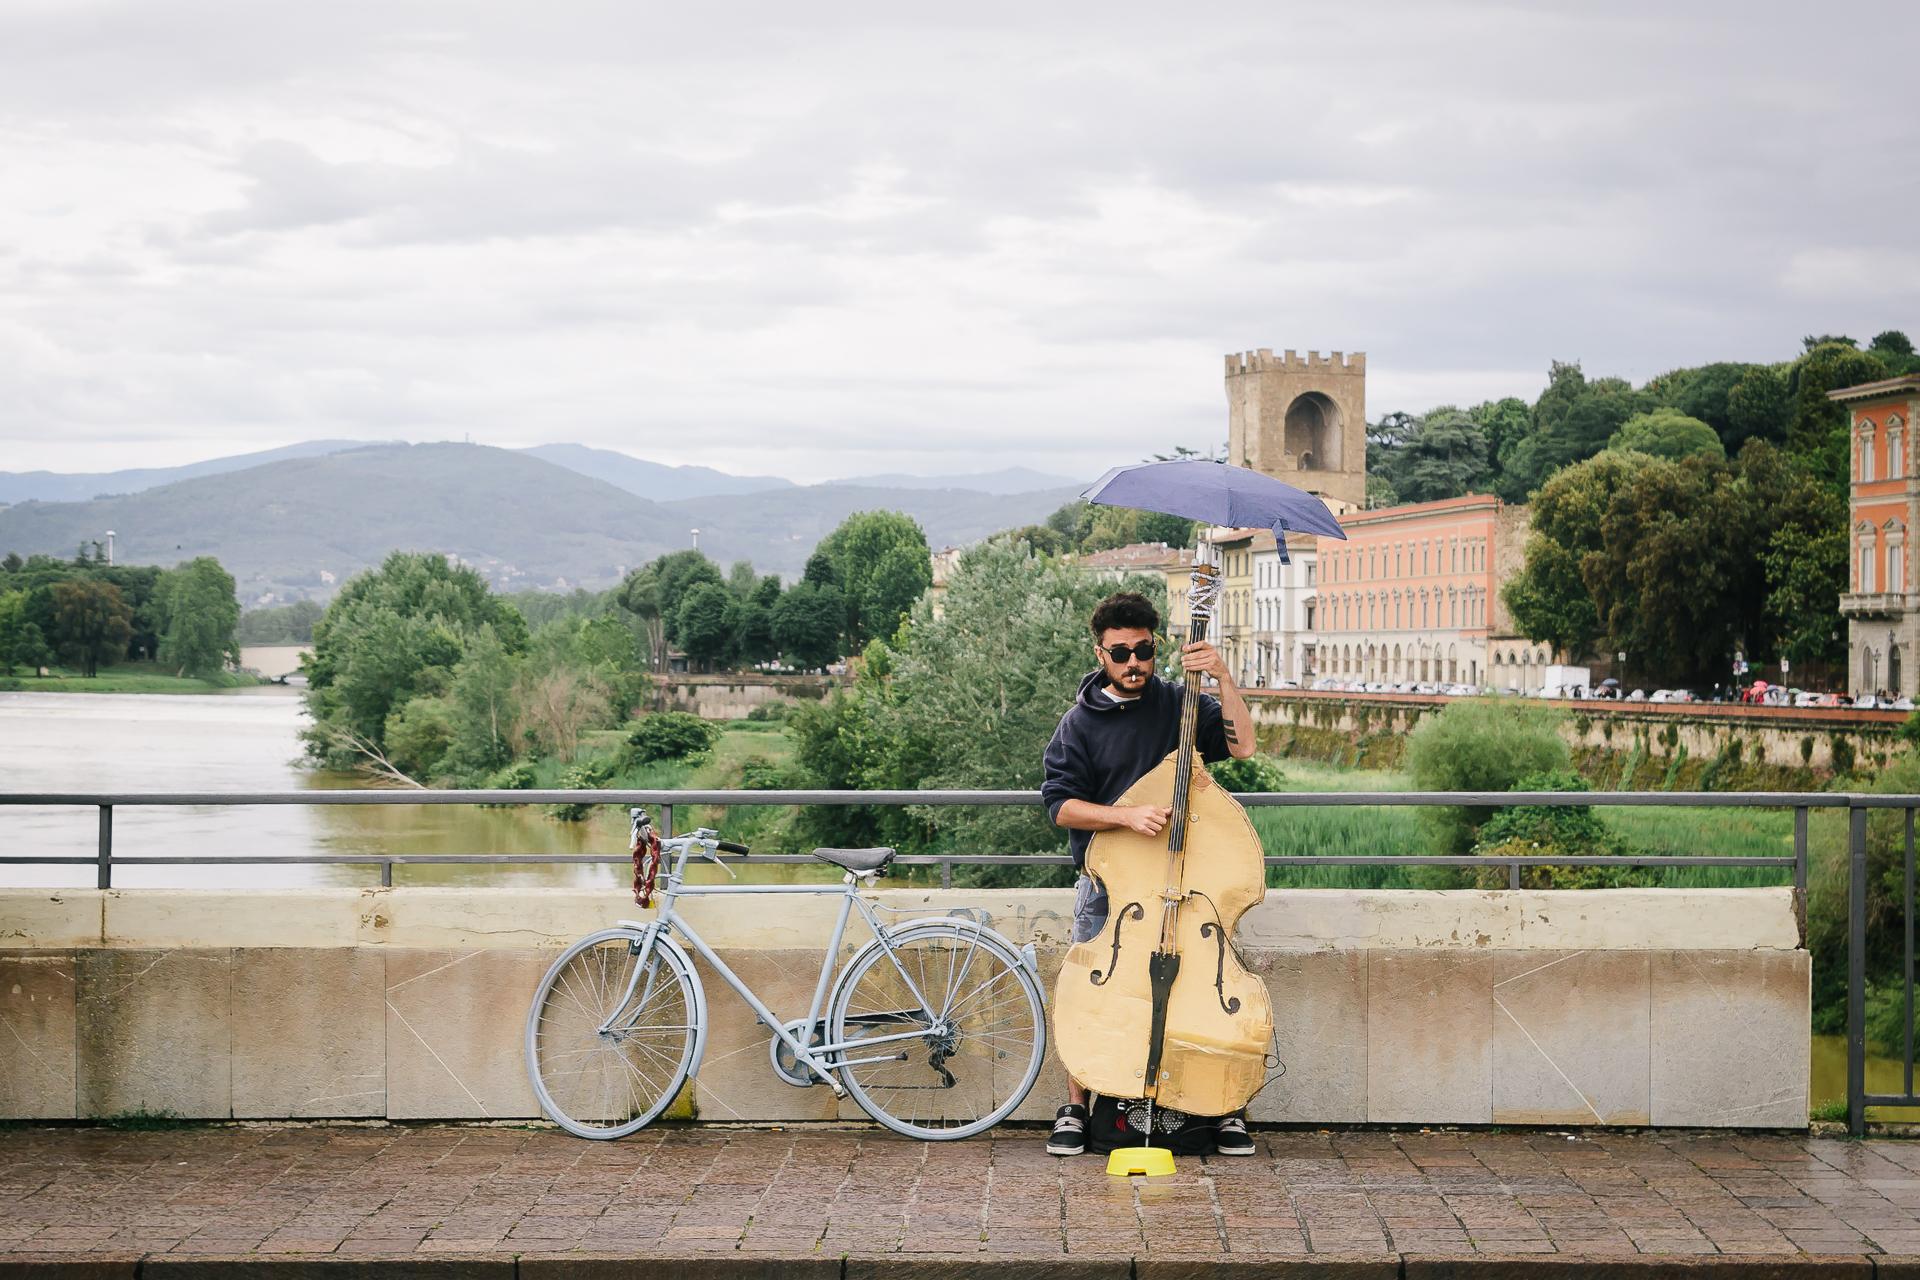 Ponte Vecchio, Piazzale Michelangelo, Firenze, Florance, Toscana, Tuscany